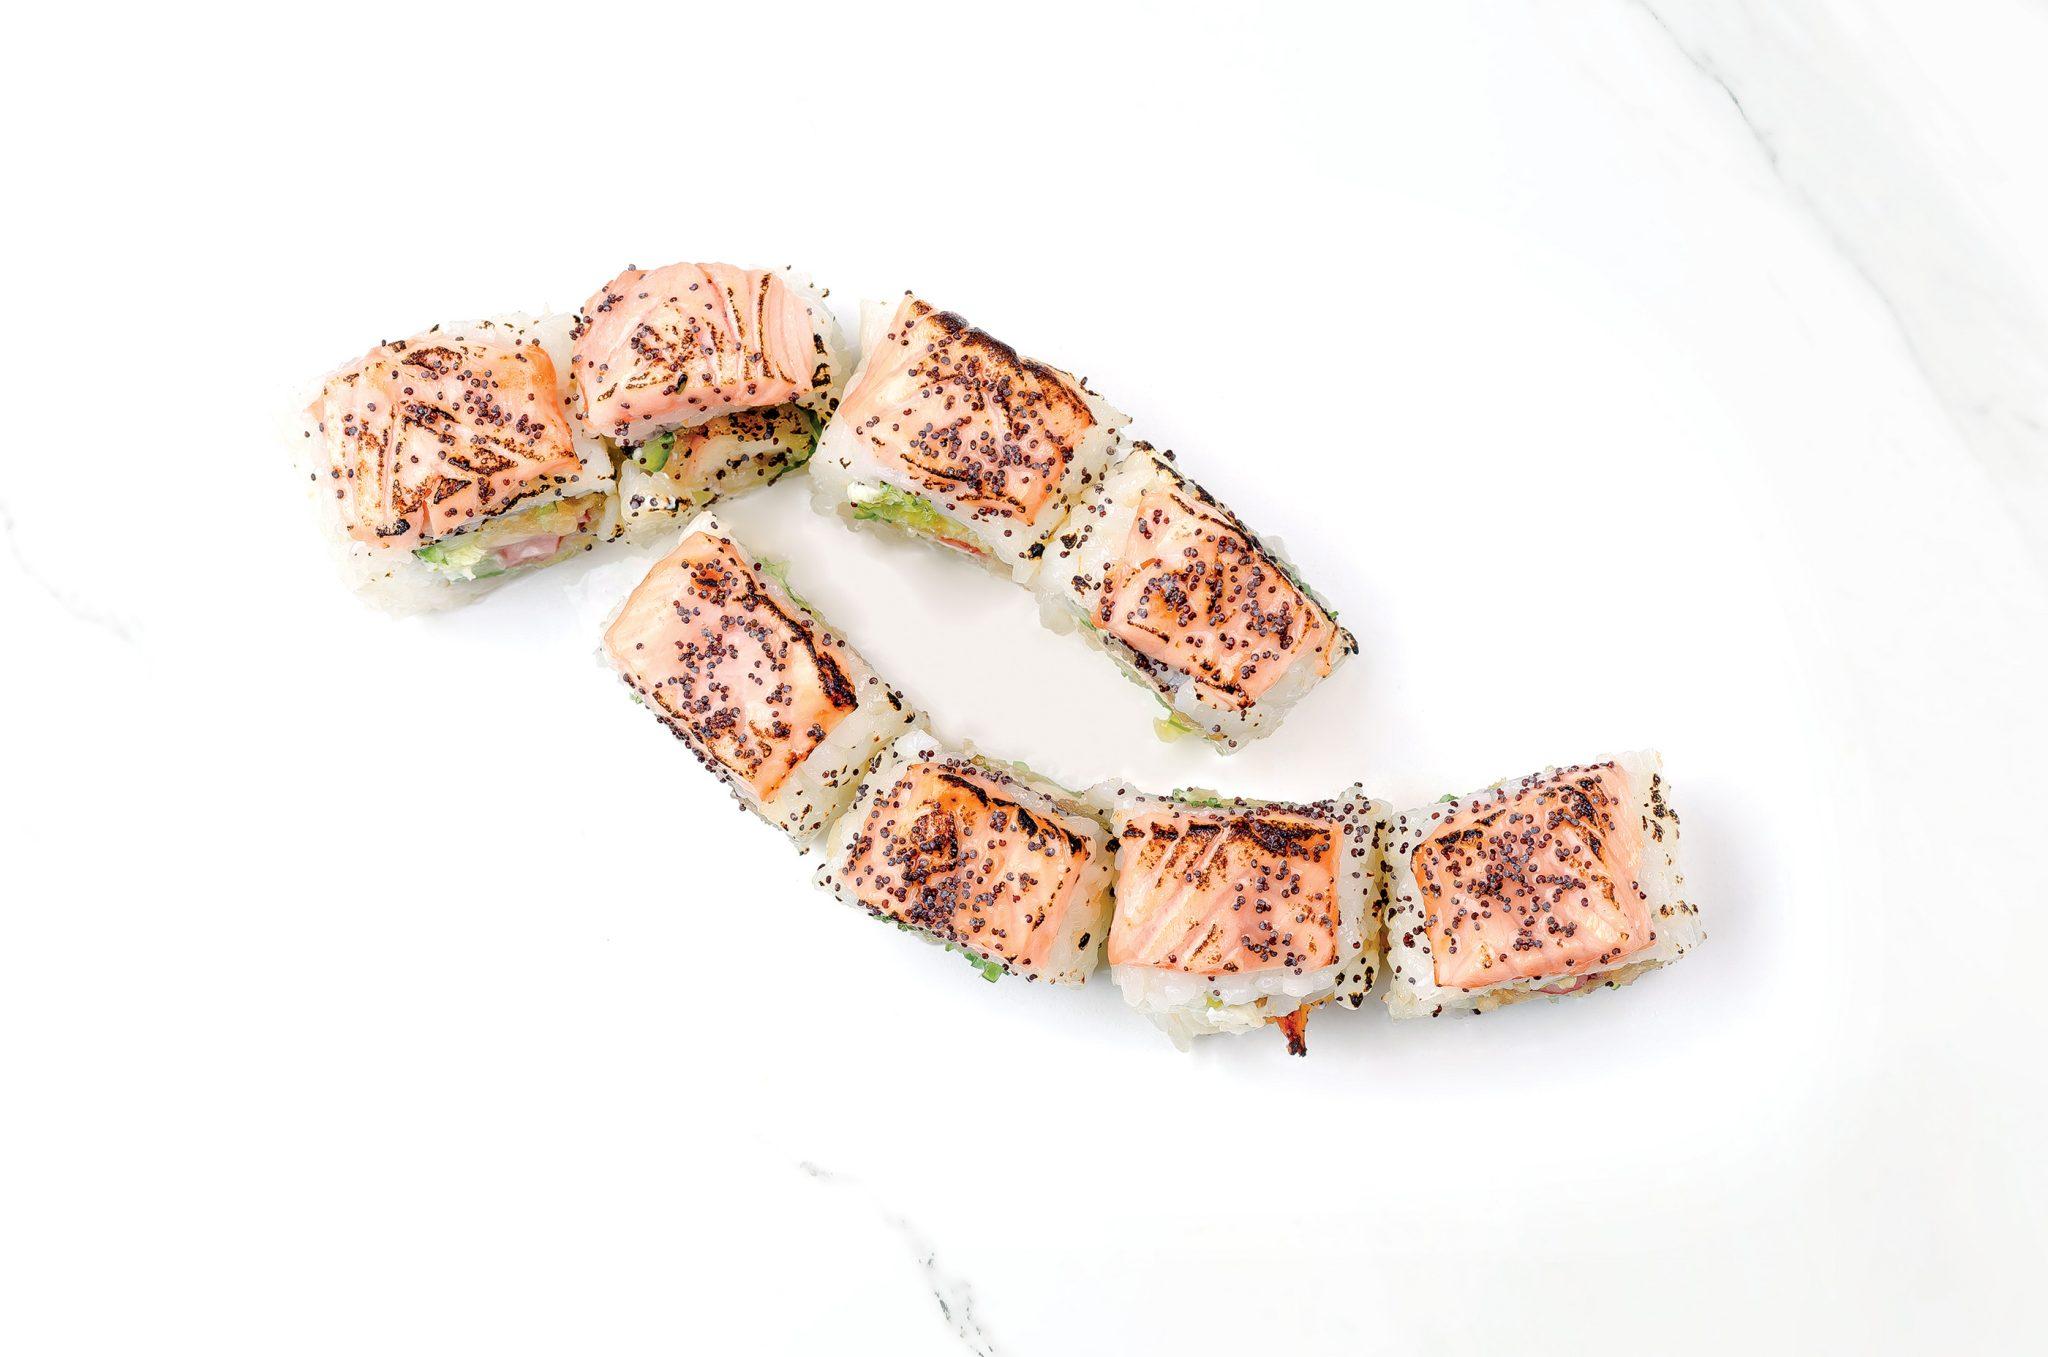 Рейнбоу суши с паниран октопод, запечена сьомга със сос от сливи